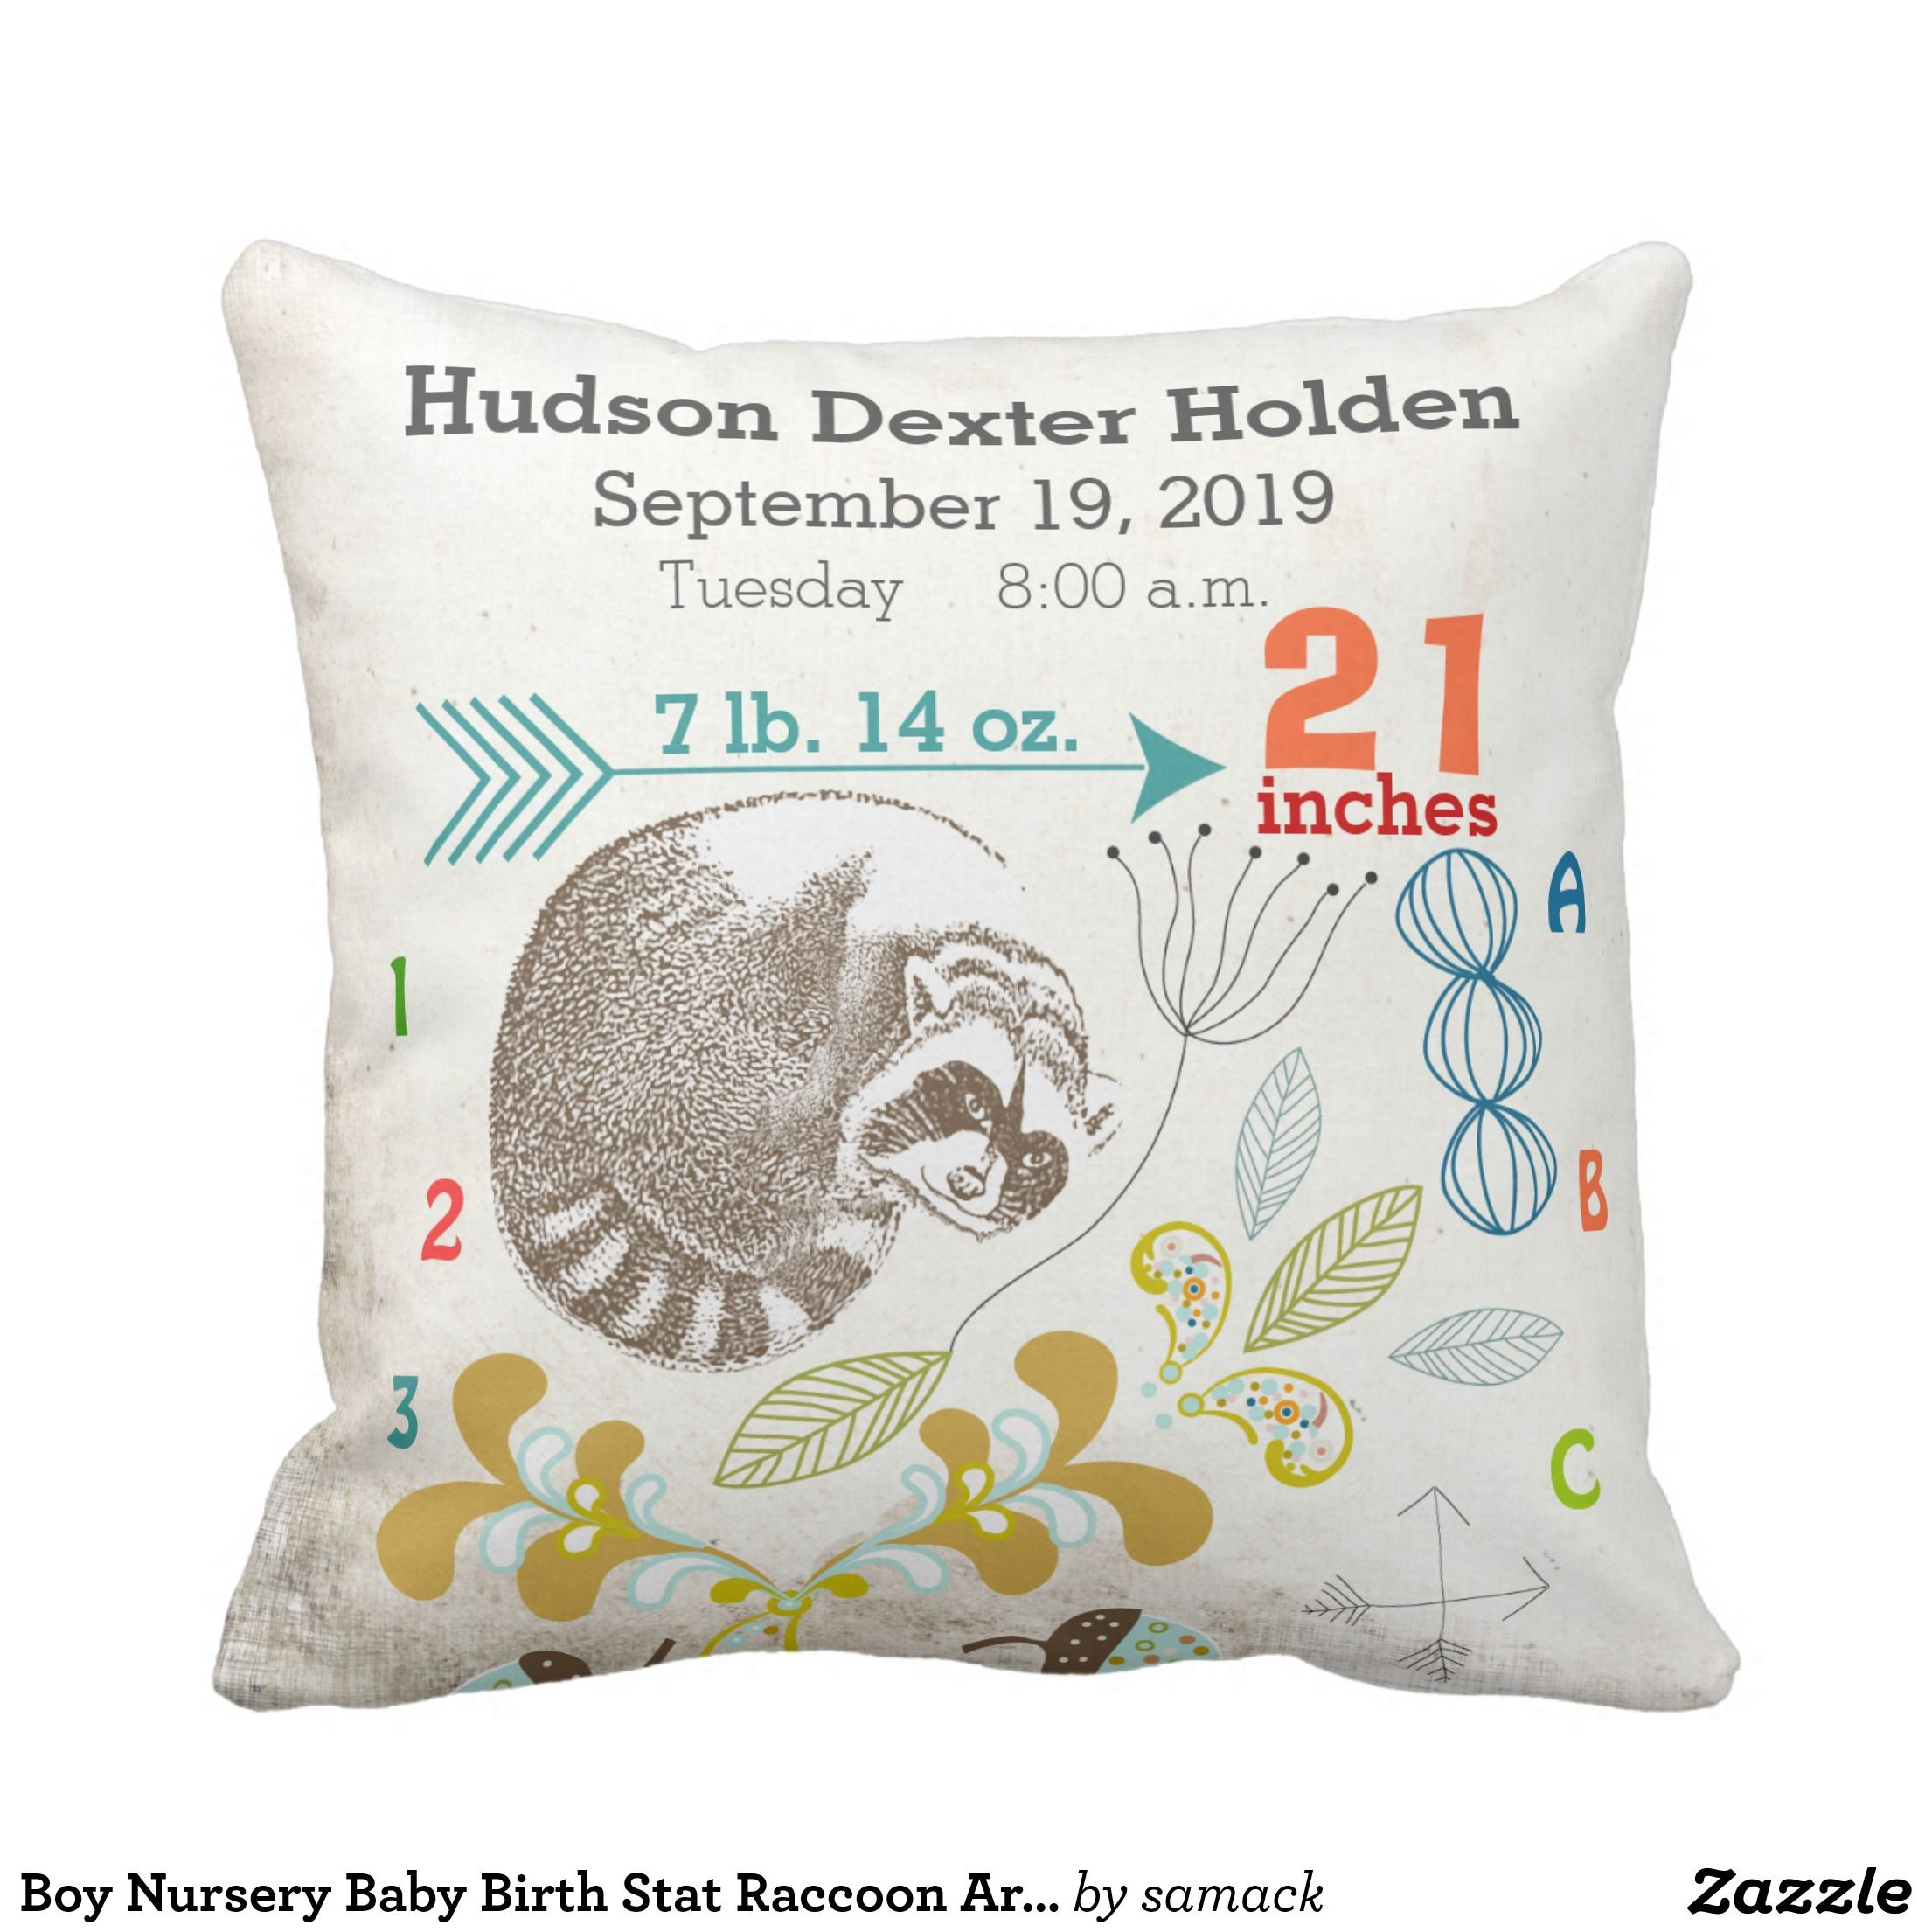 Boy Nursery Baby Birth Stat Raccoon Arrow Pattern Pillow